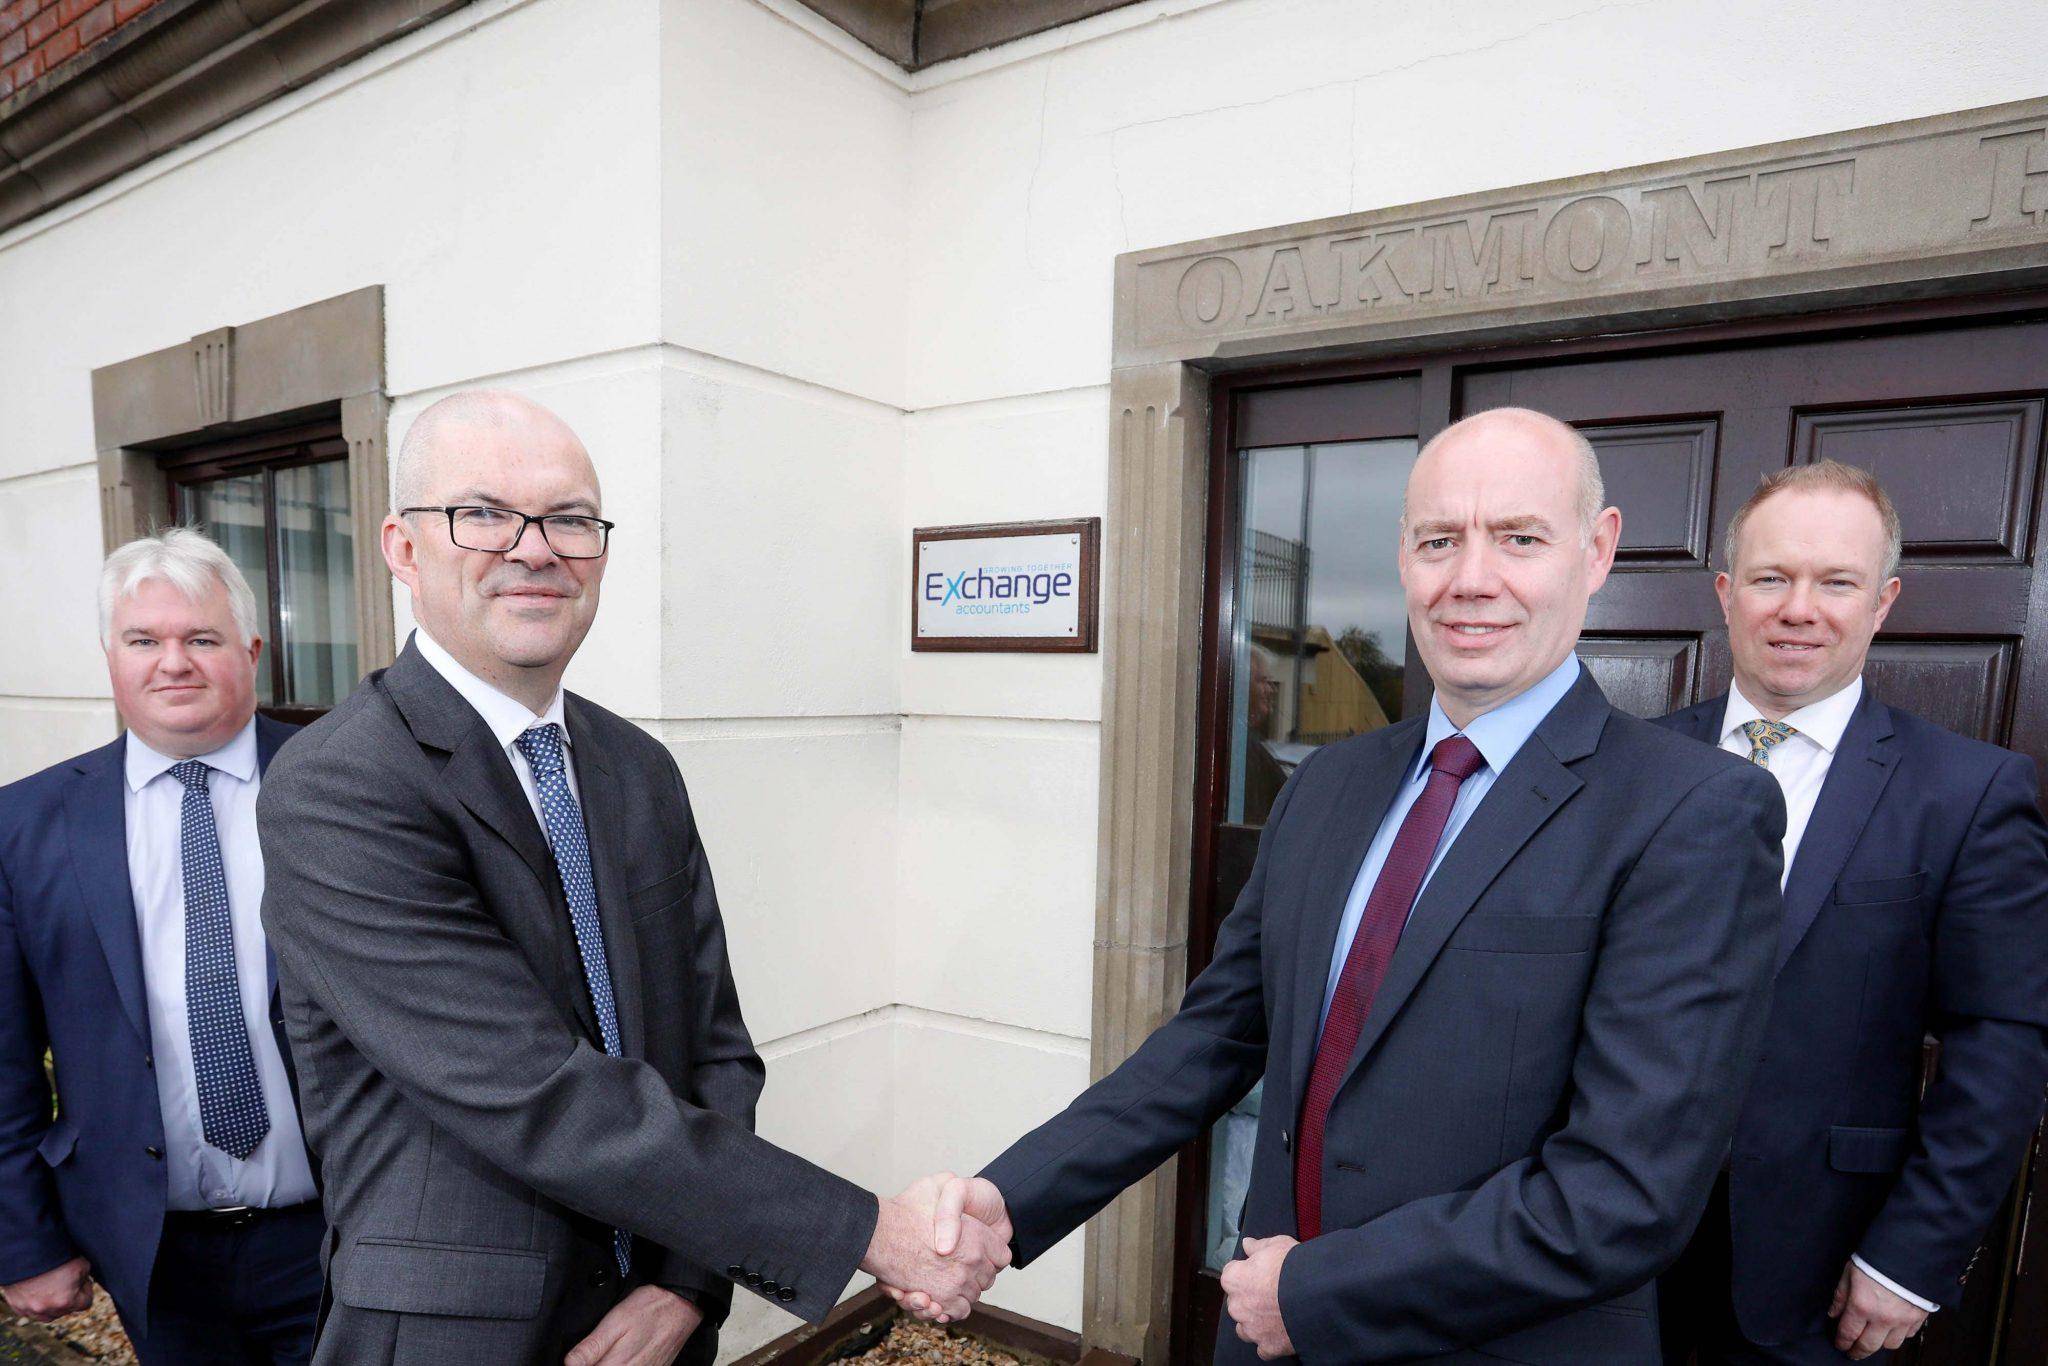 Fitzmaurice McConville & Co Ltd is now Exchange Accountants